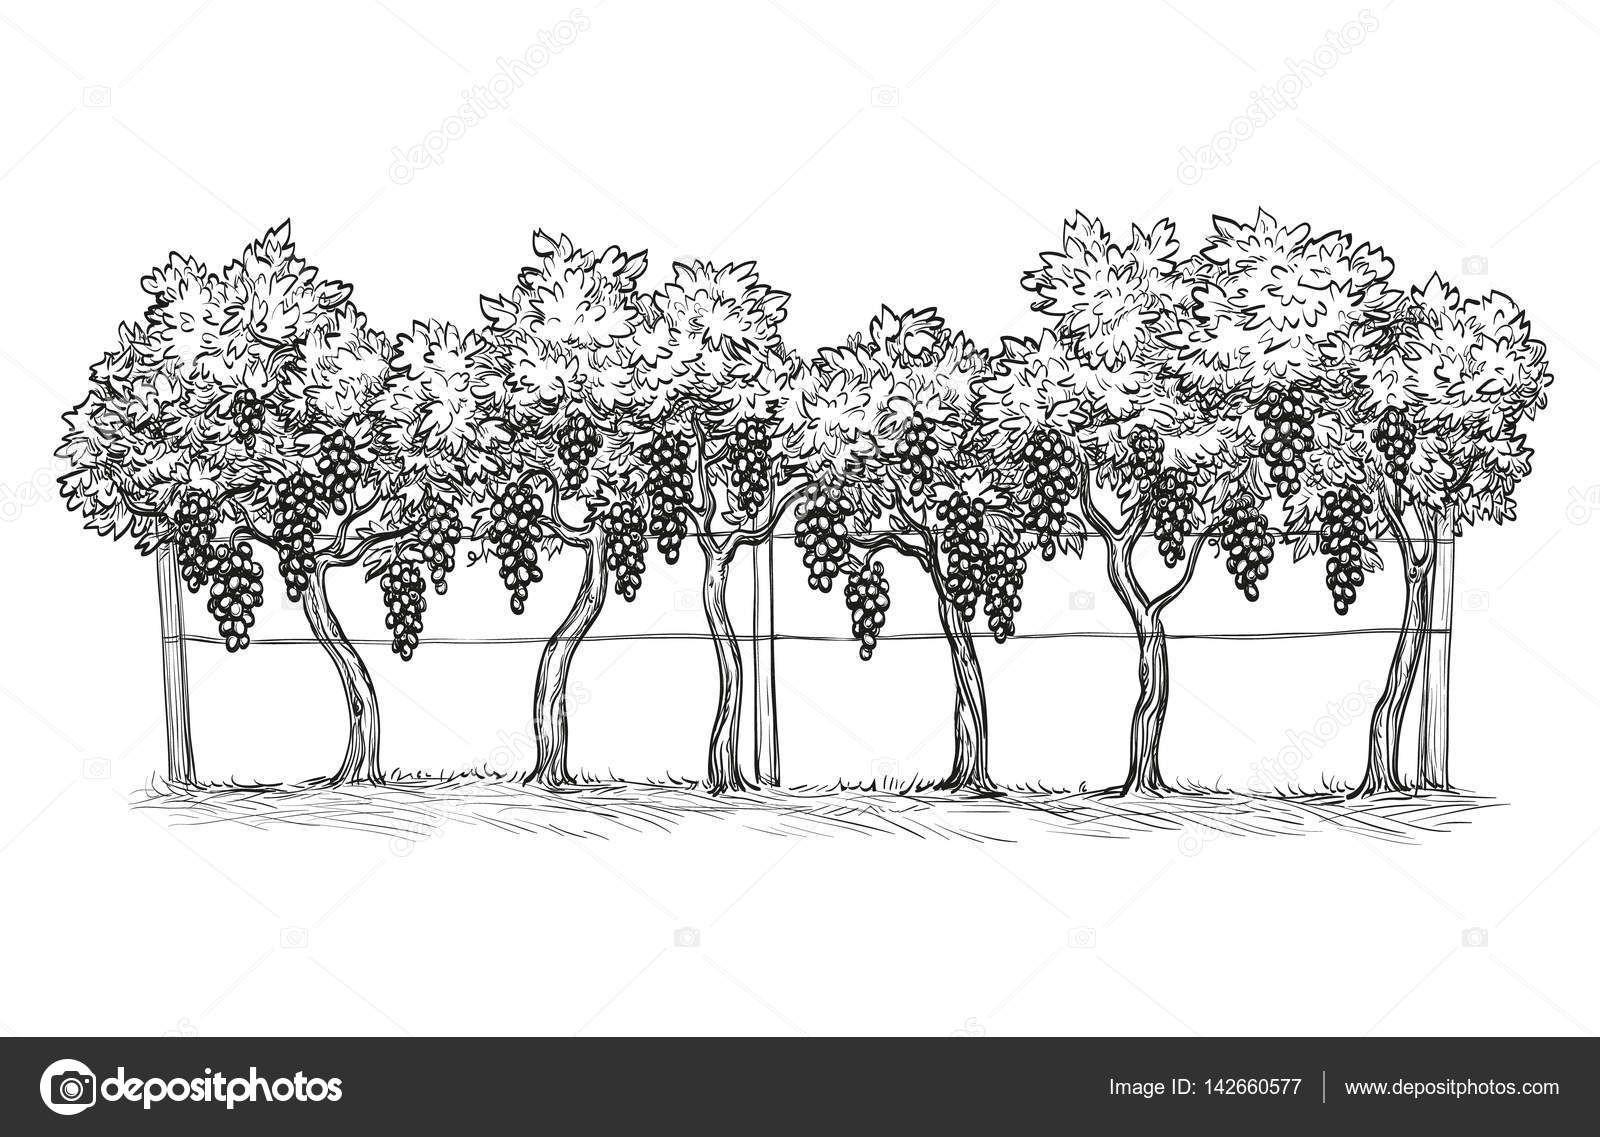 Stazeni Royalty Free Rucne Kreslene Vektorove Ilustrace Vinice Revy